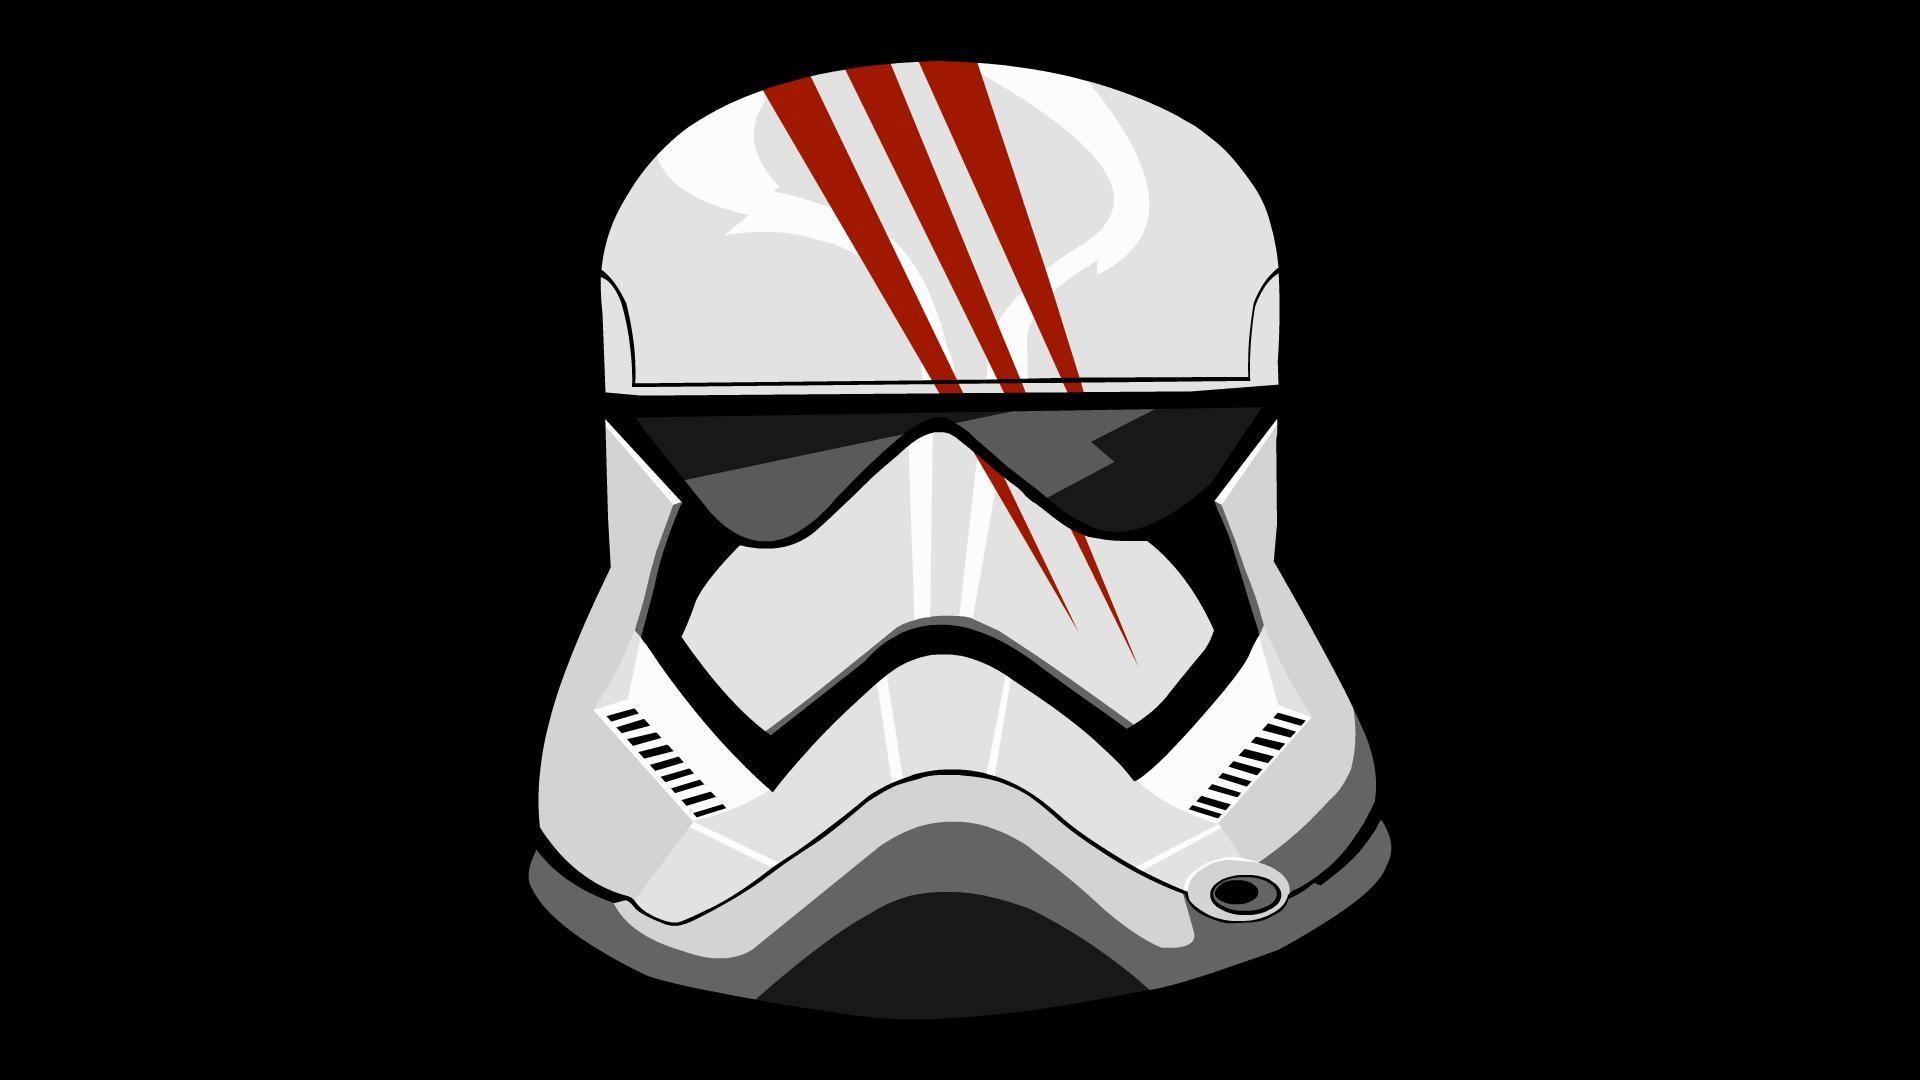 wallpaper.wiki-Stormtrooper-Wallpaper-HD-Free-Download-PIC-